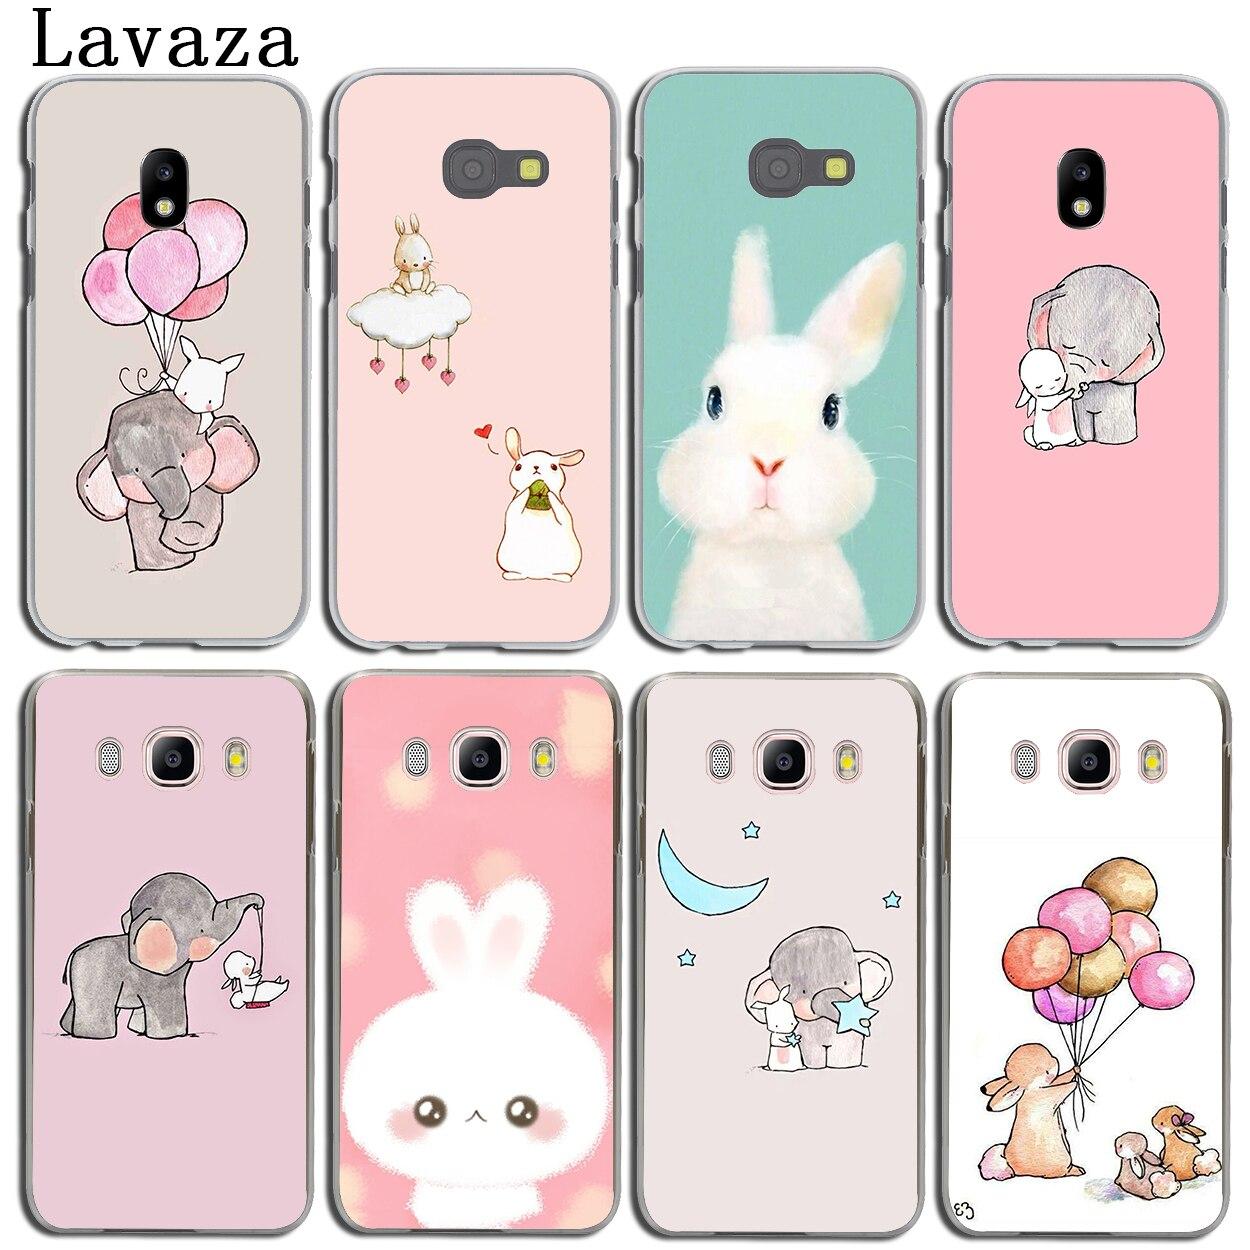 Lavaza Cute Elephant Rabbit Phone Shell Case for Samsung Galaxy J3 J1 J2 J7 J5 2015 2016 2017 J2 Pro Ace J7 J3 J5 Prime Case